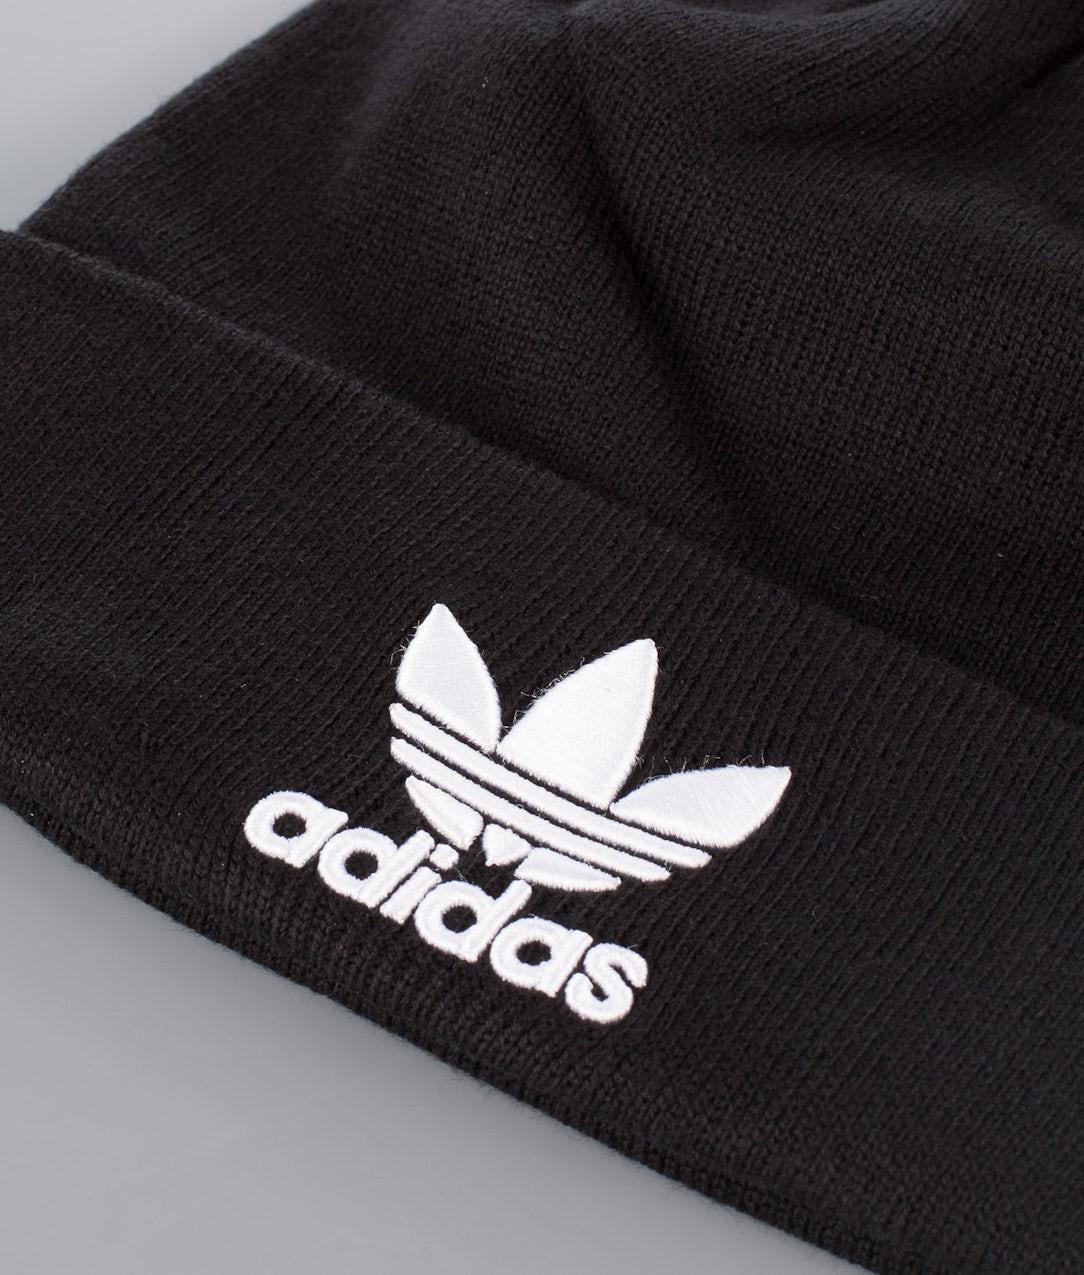 brand new cf308 f1222 Adidas Originals Trefoil Berretto Black